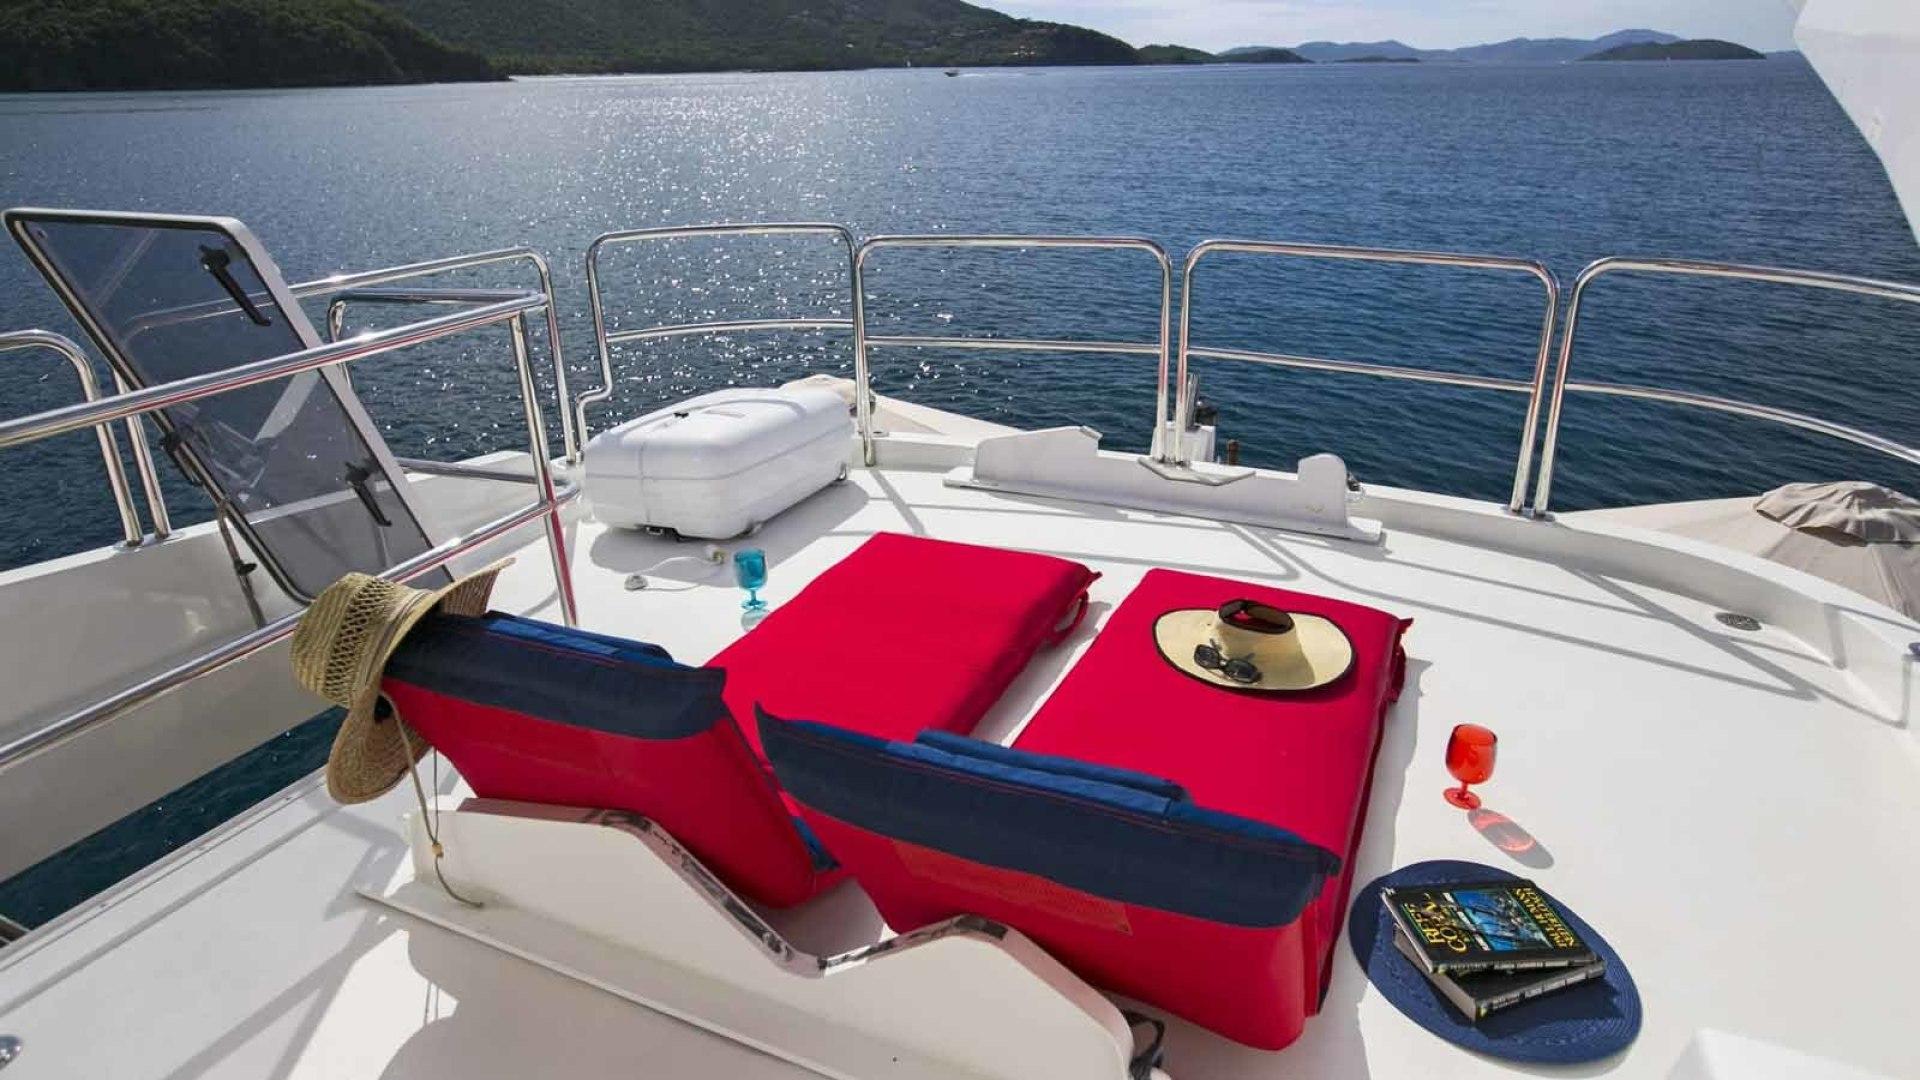 Queenship-Barretta 76 2004-SEA MYSTIC Fort Myers-Florida-United States-Boat Deck-1588144 | Thumbnail